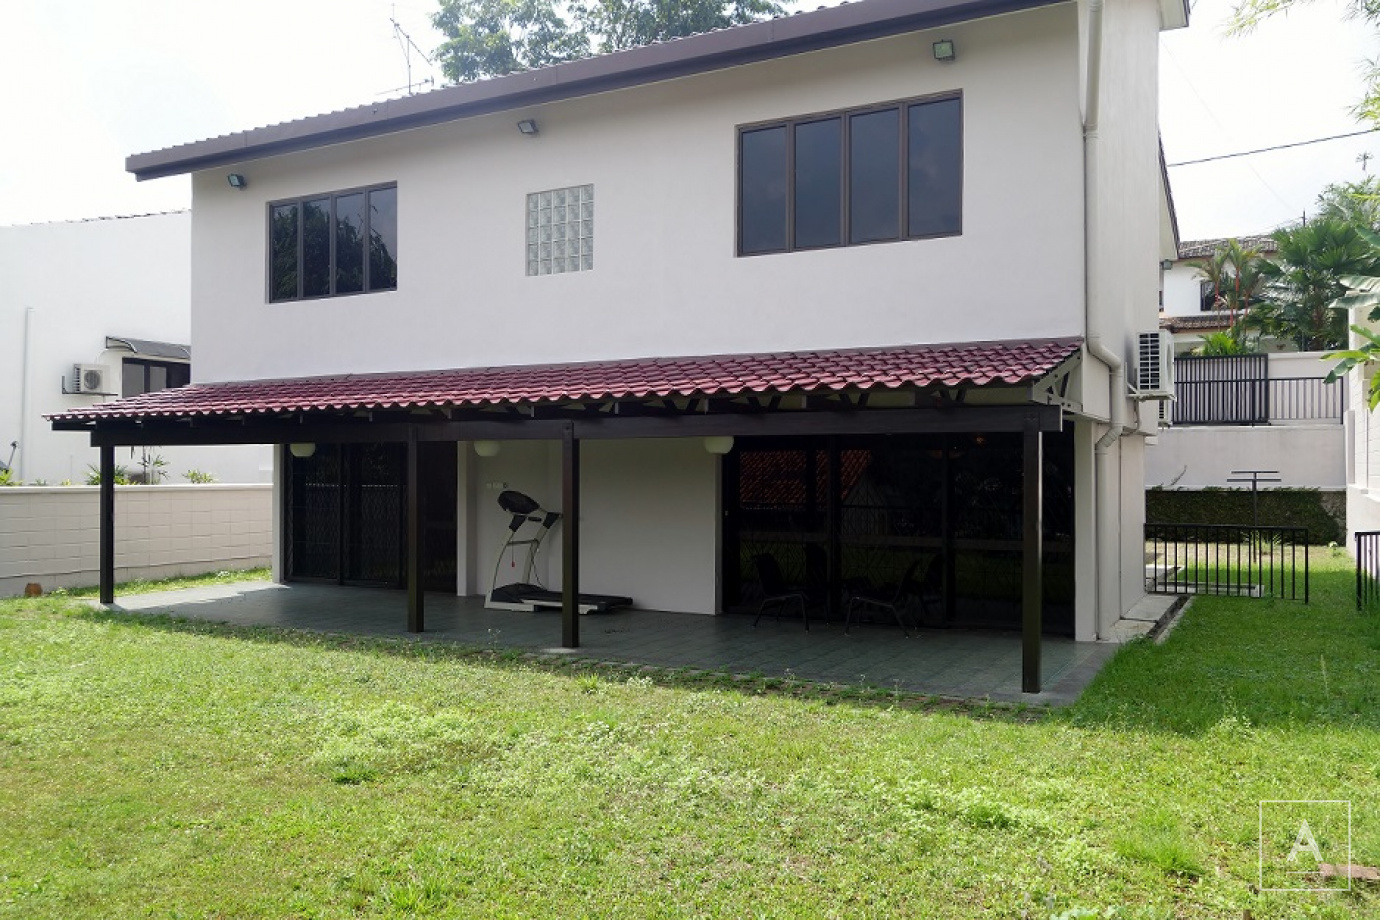 Bangsar,Kuala Lumpur, 6 Bedrooms Bedrooms, ,4 BathroomsBathrooms,Bungalow / Detached,To Let,Jalan Mambu,1097